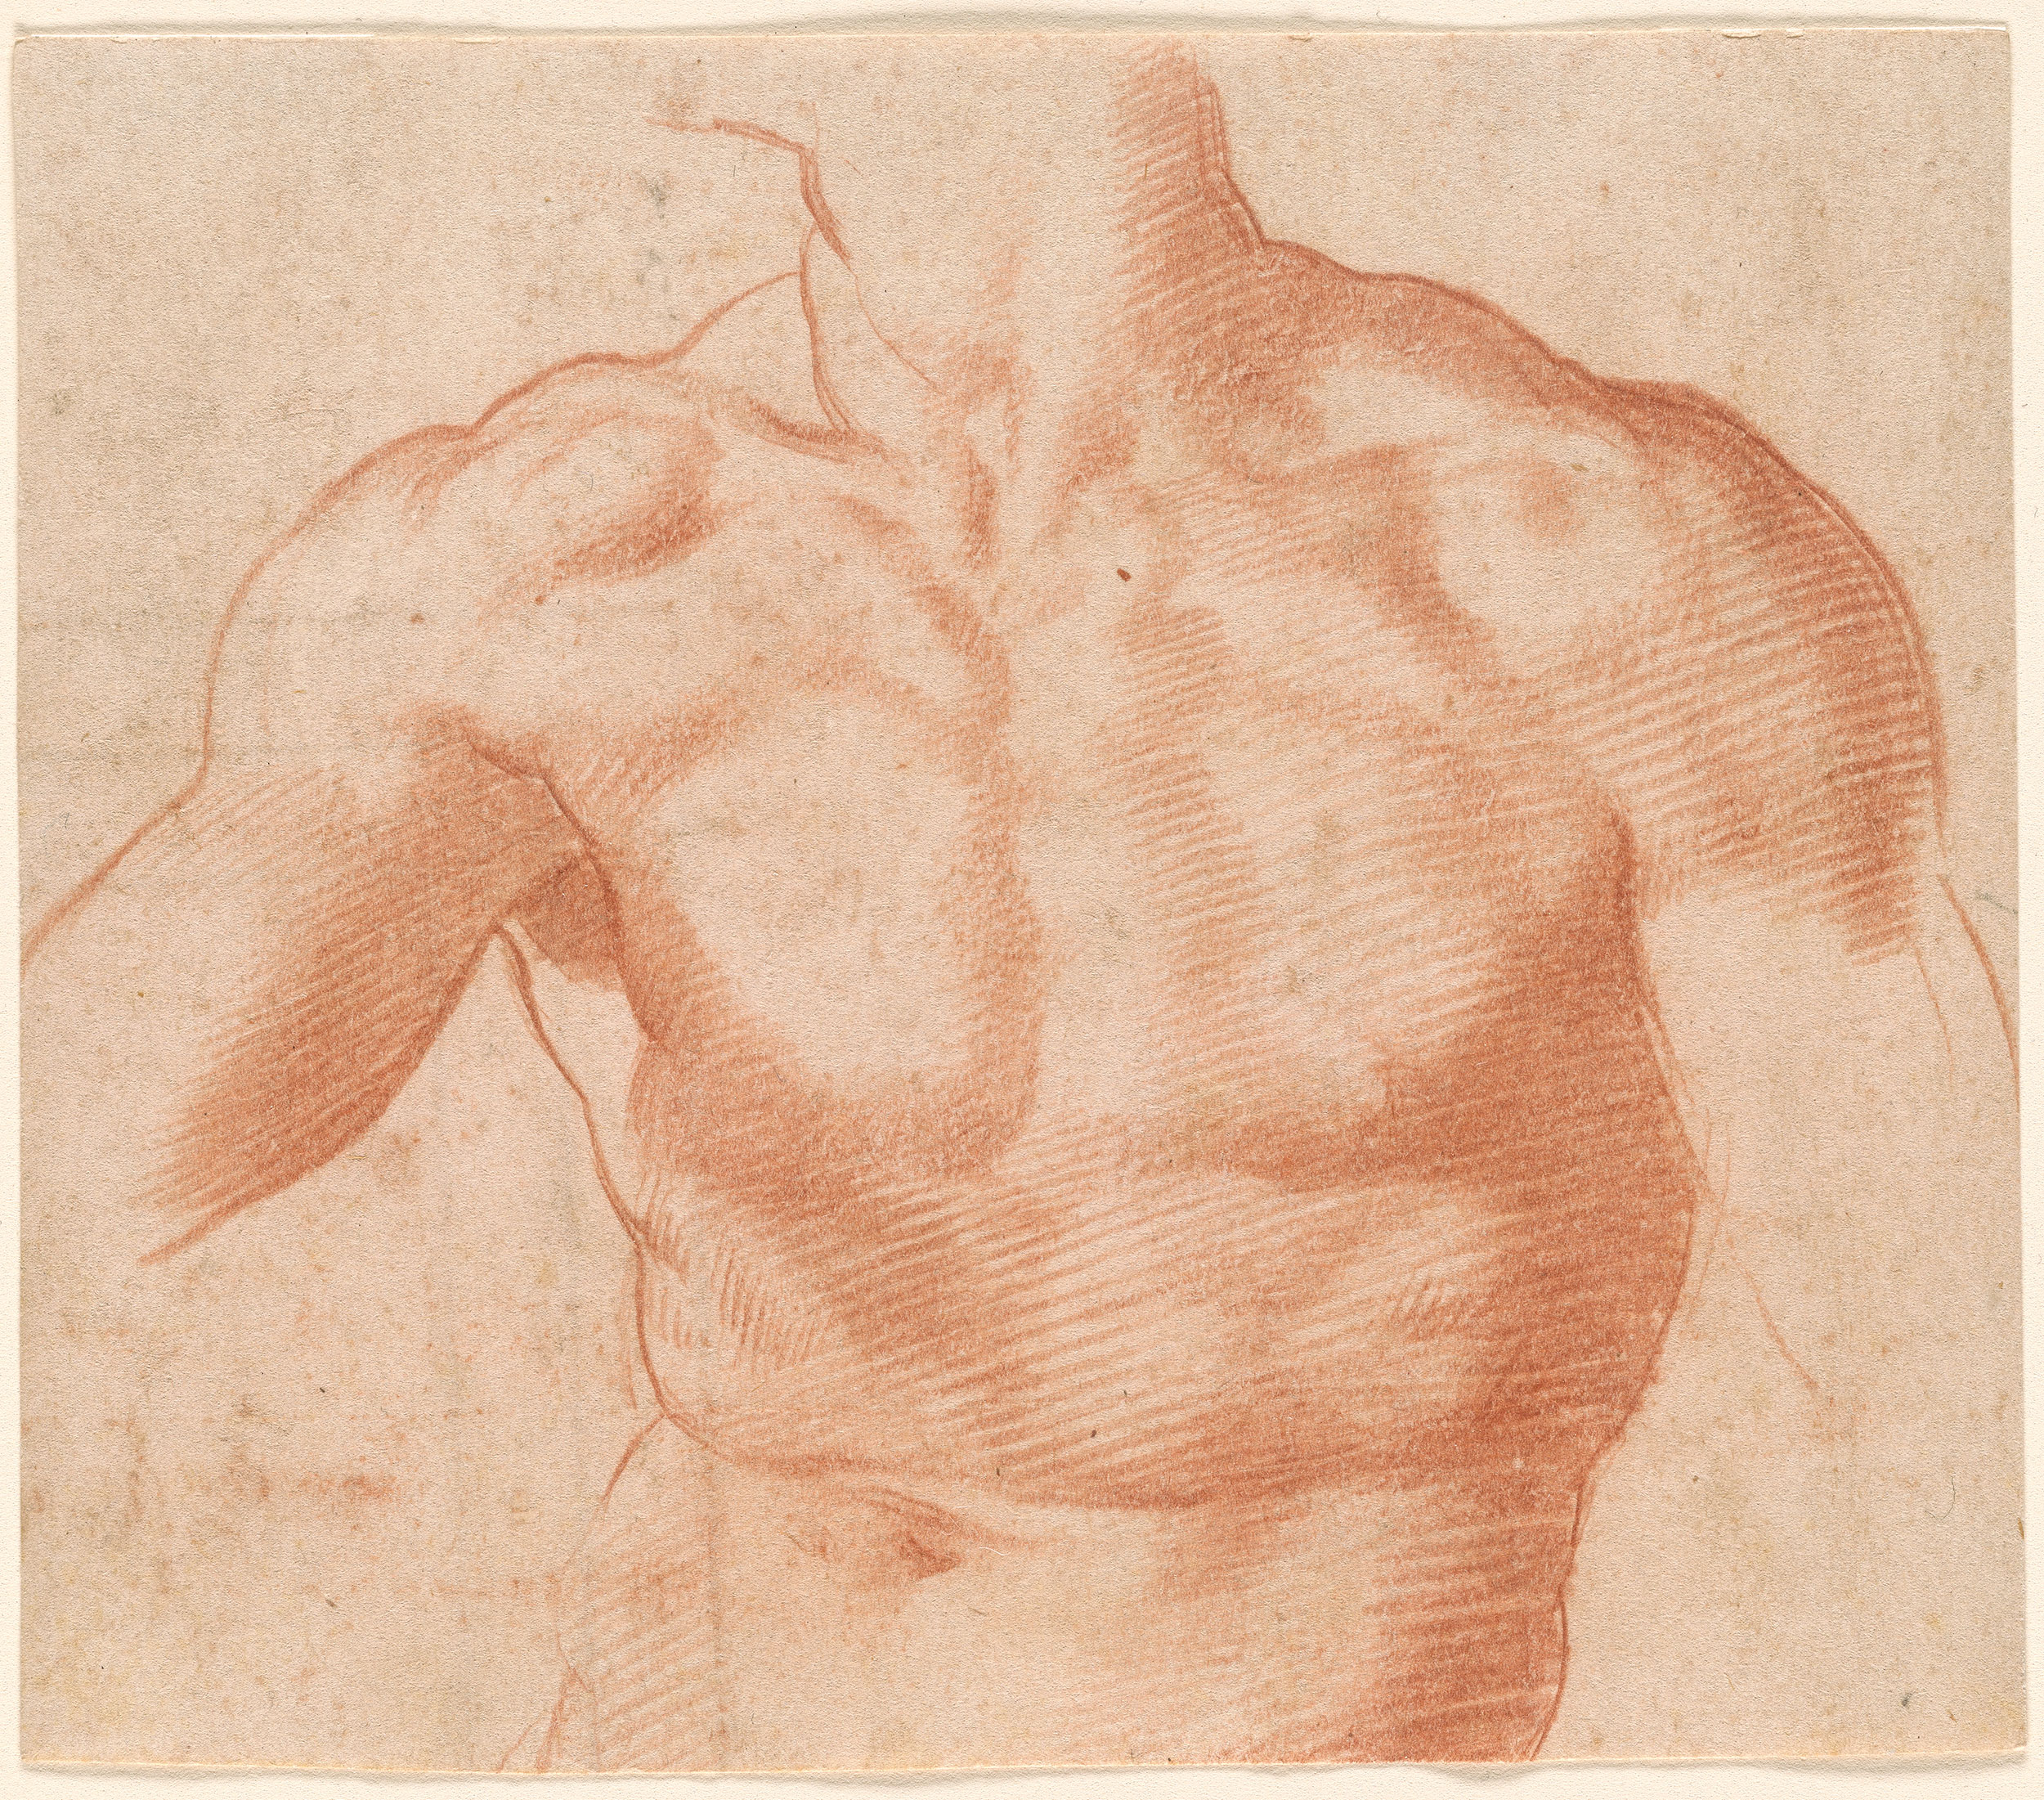 Francesco Salviati Drawings 217583v_0001.jpg